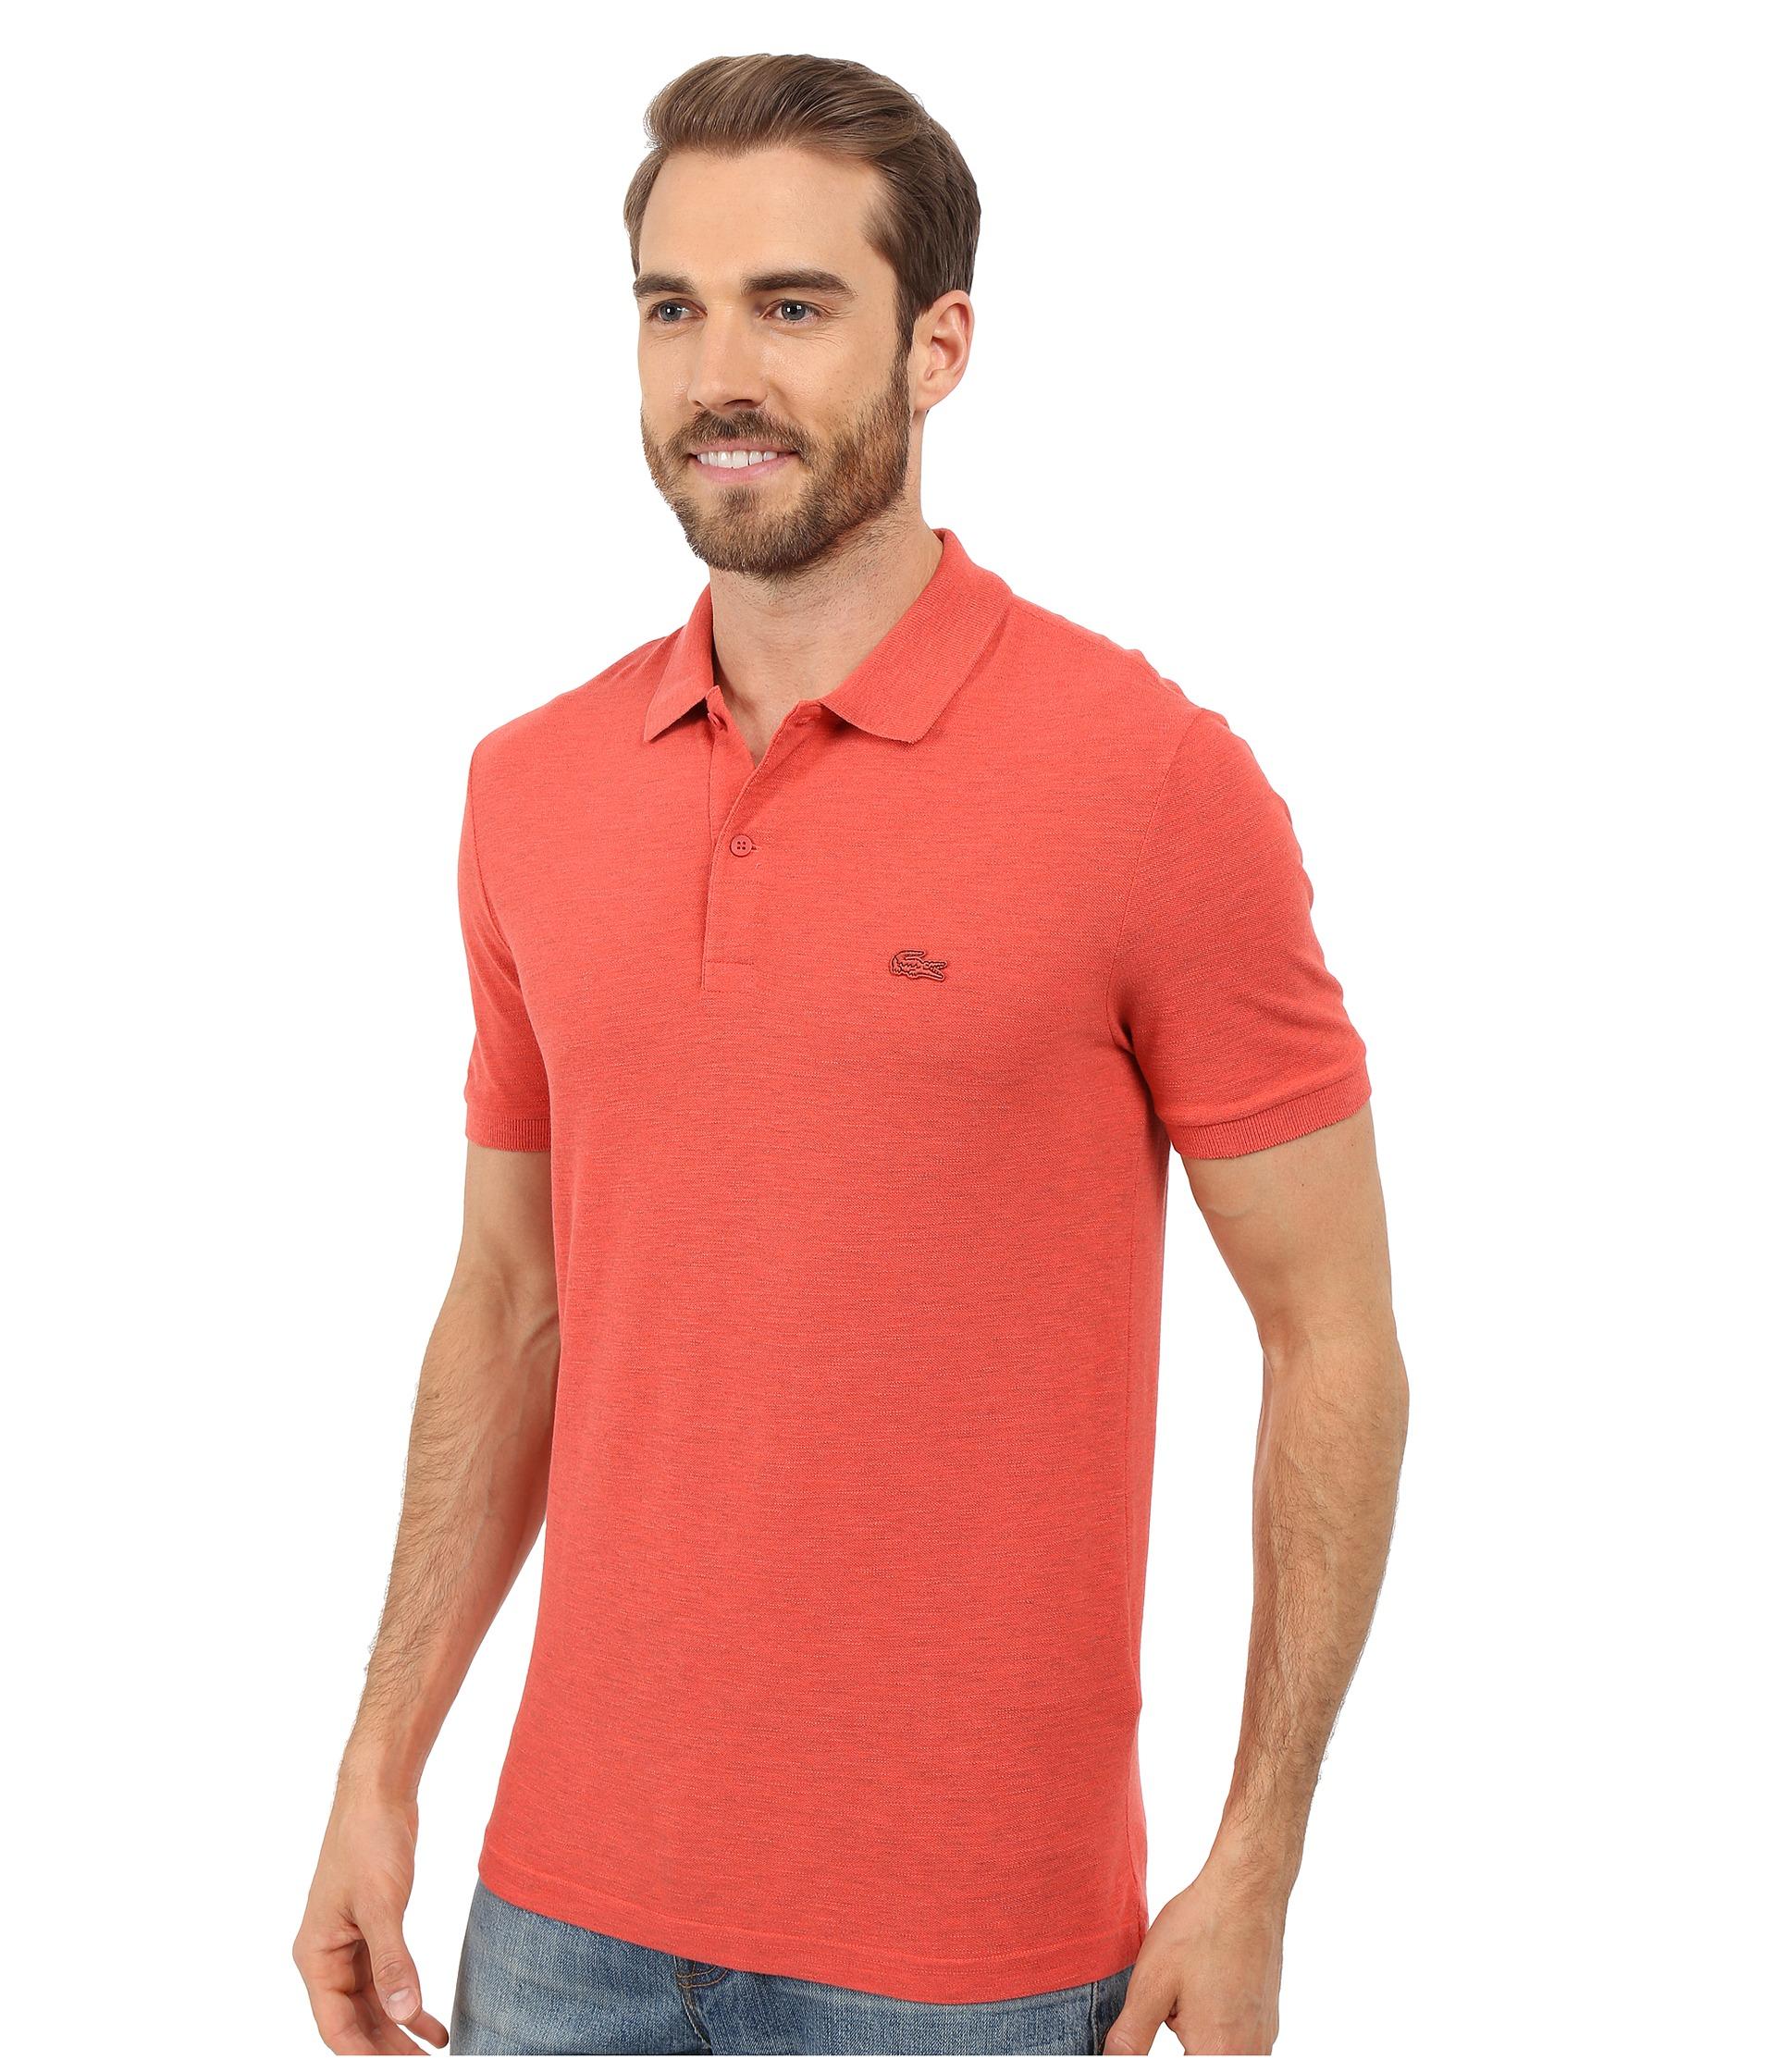 Lacoste short sleeve garment dyed slub pique polo shirt for Short sleeve lacoste shirt